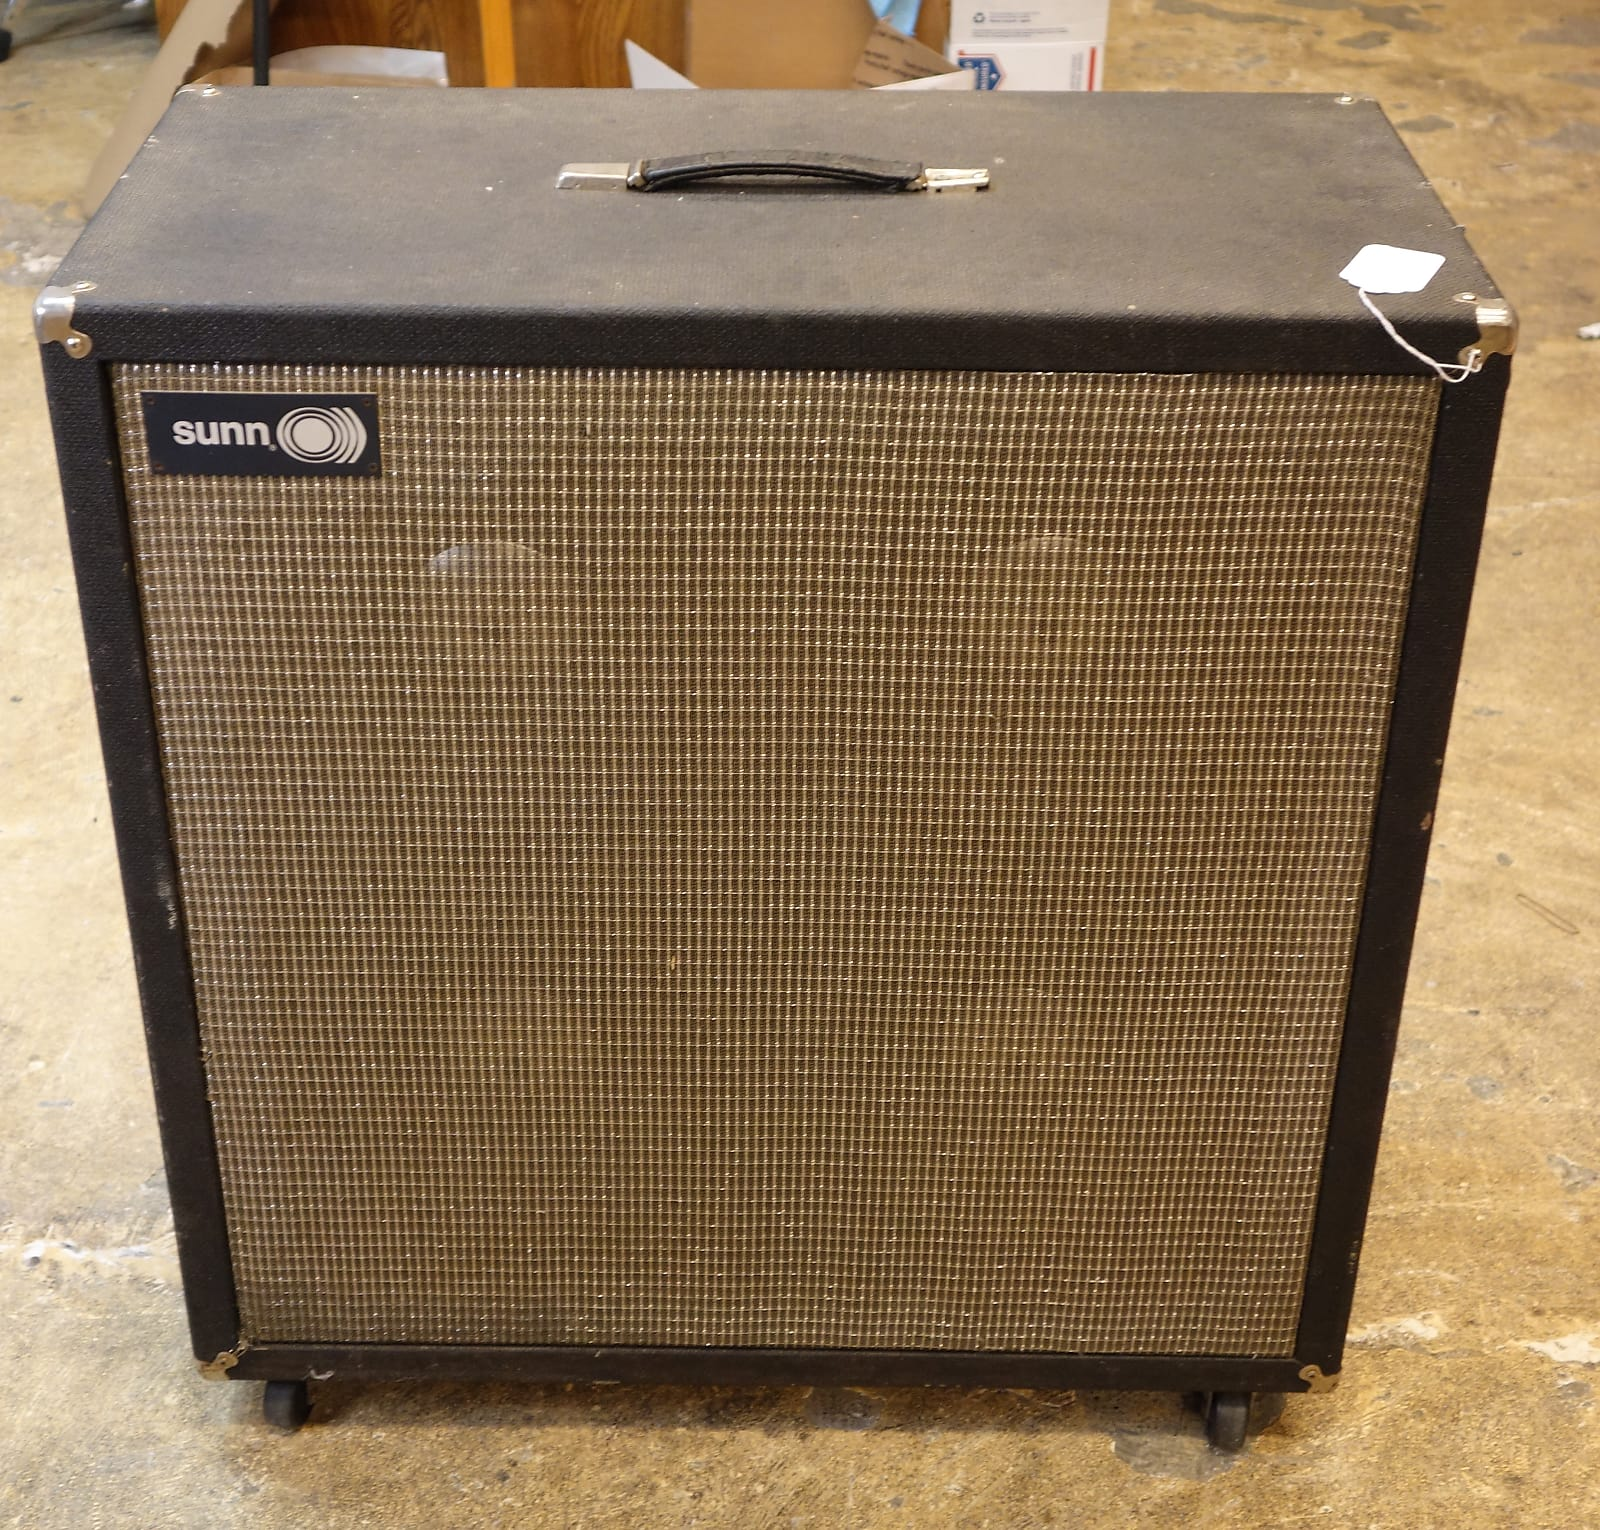 Vintage Sunn 4x12 412 S electric guitar cabinet (original speakers)